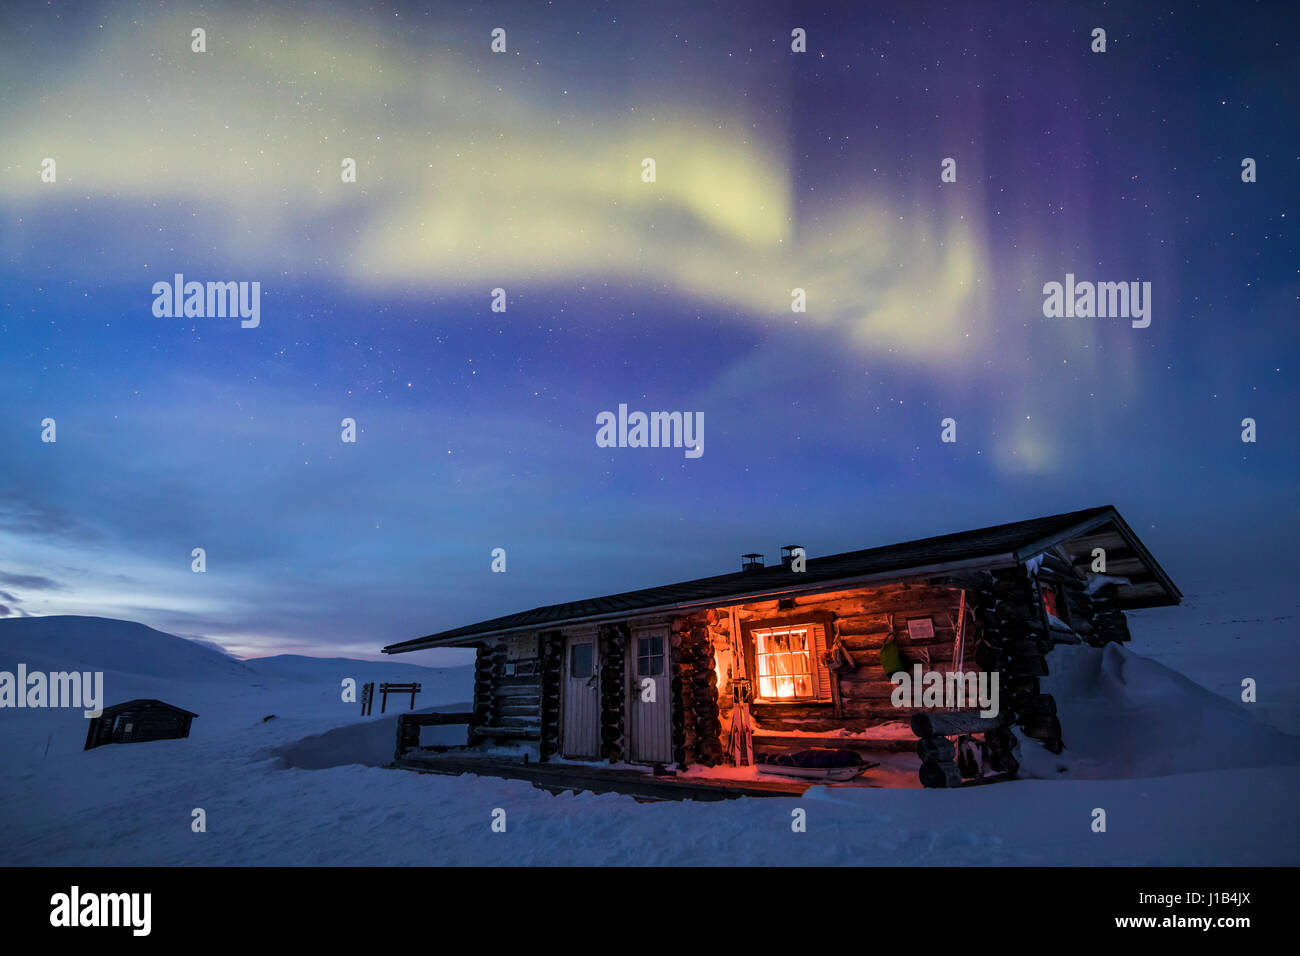 Pihtsusjärvi open wilderness hut - Stock Image